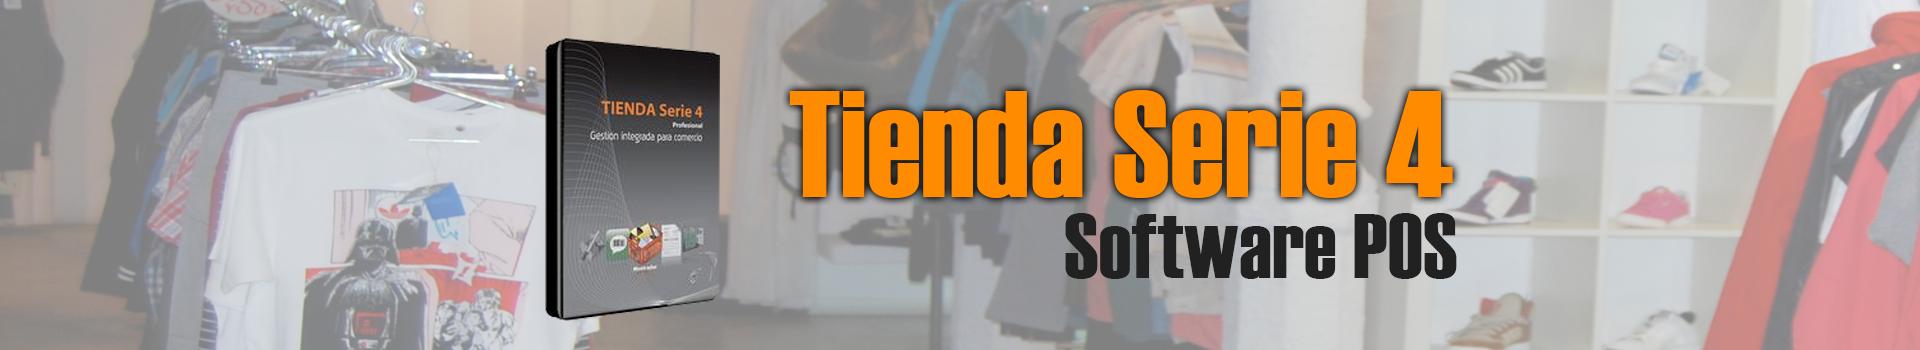 Tienda Serie 4